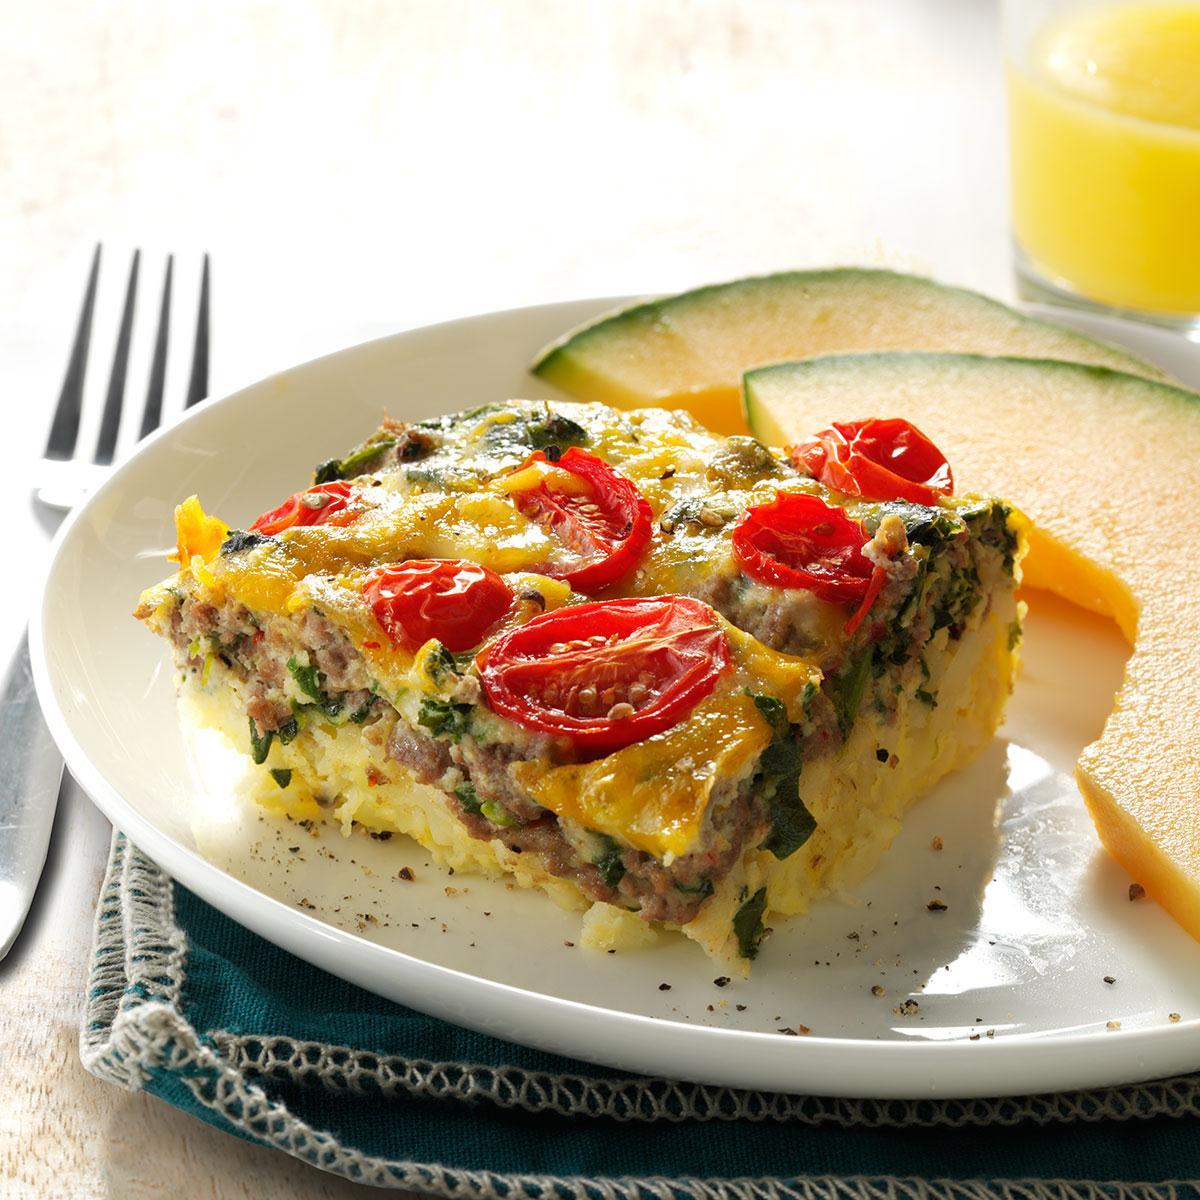 Beef, Potato & Egg Bake Recipe